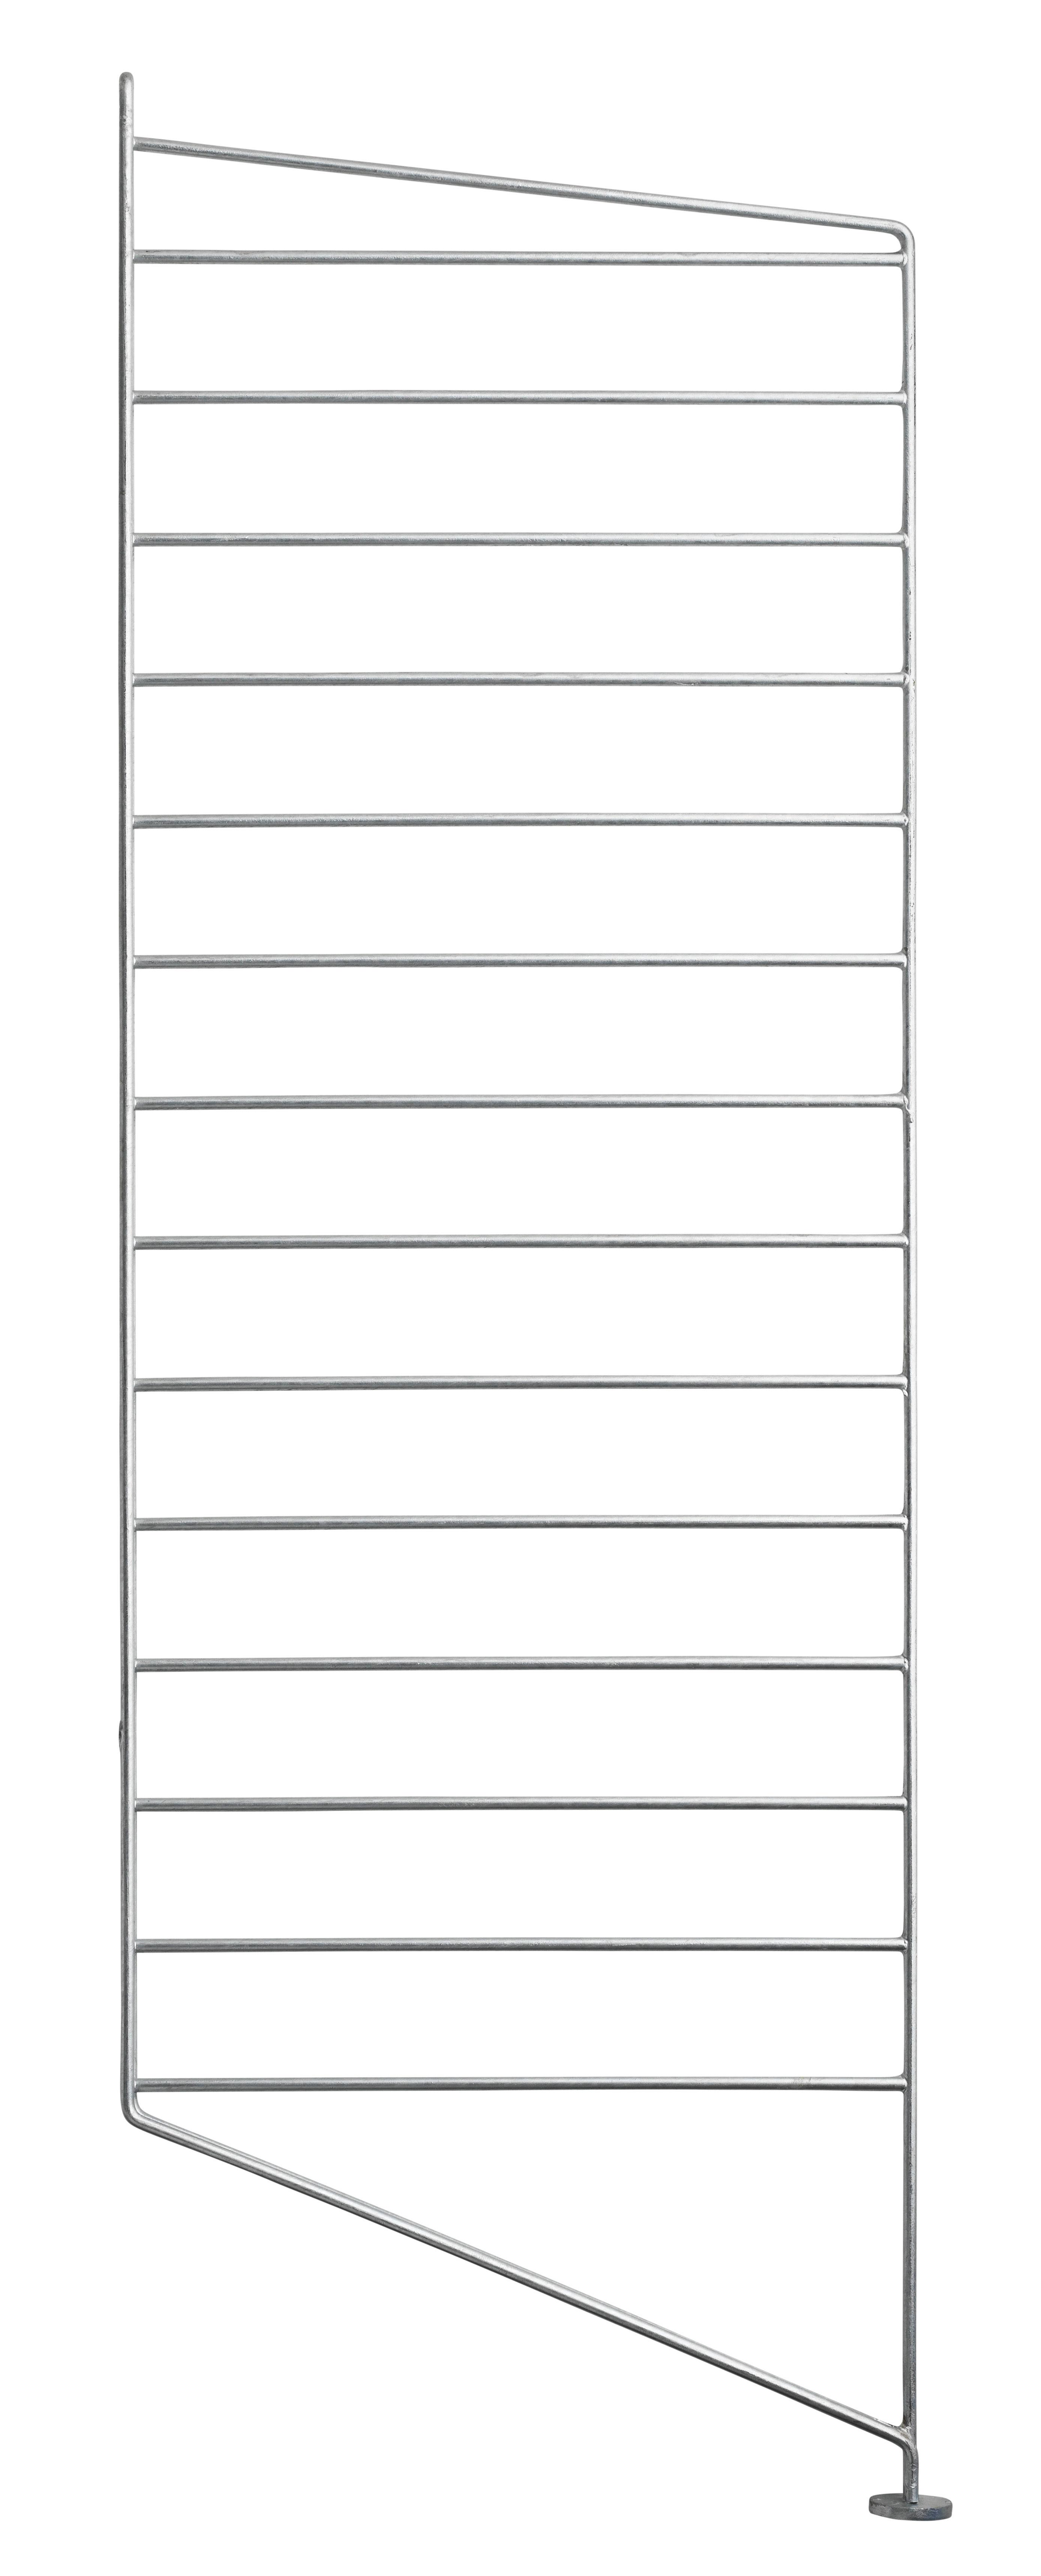 Furniture - Bookcases & Bookshelves - String Outdoor Floor mount - / Galvanised steel - H 85 x D 30 cm - individual unit by String Furniture - Single unit / Galvanised - Galvanized steel